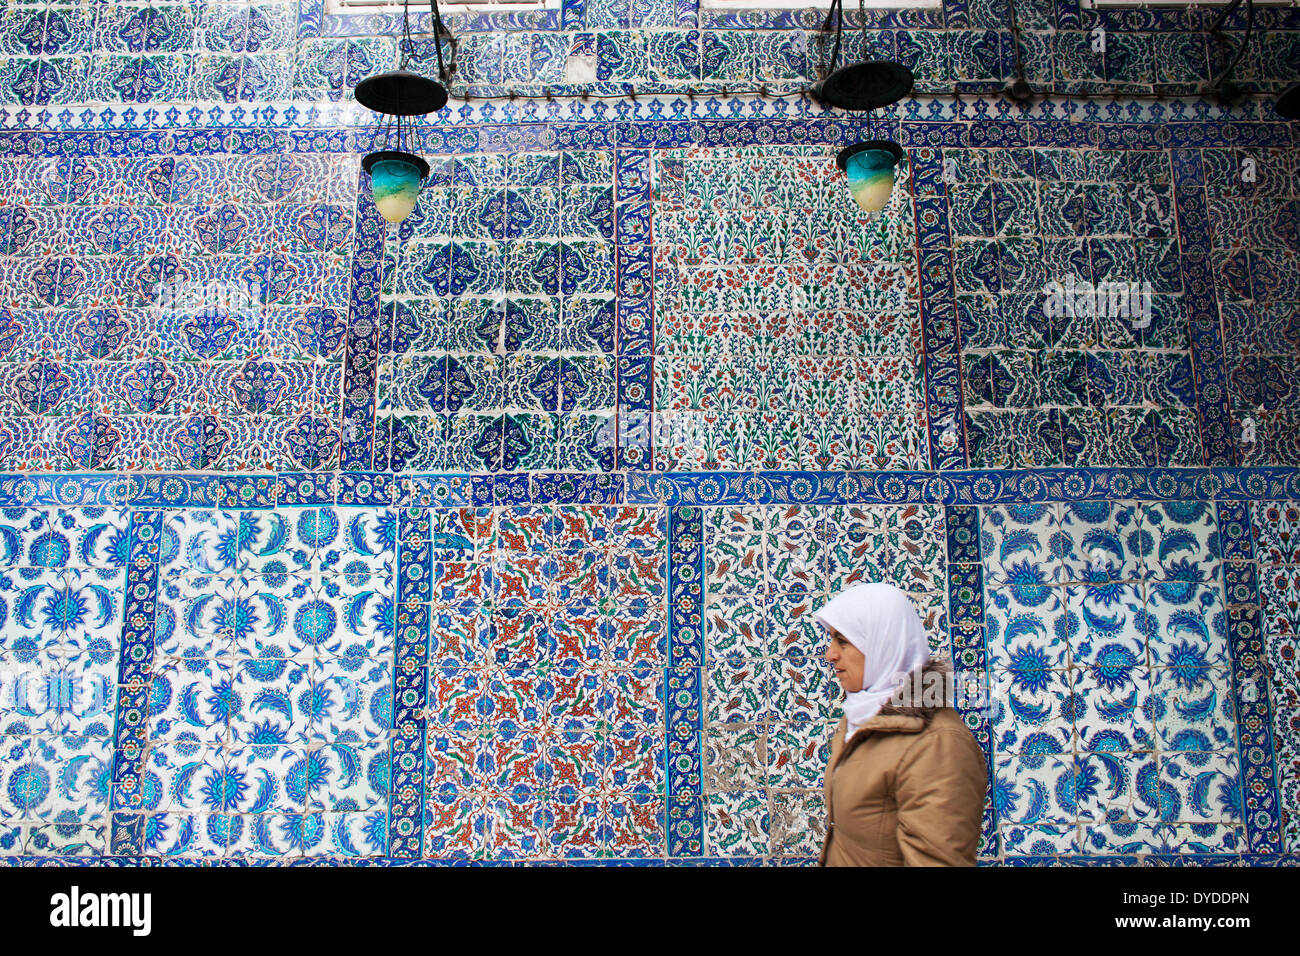 Arabesque at Eyup Sultan Mosque. - Stock Image